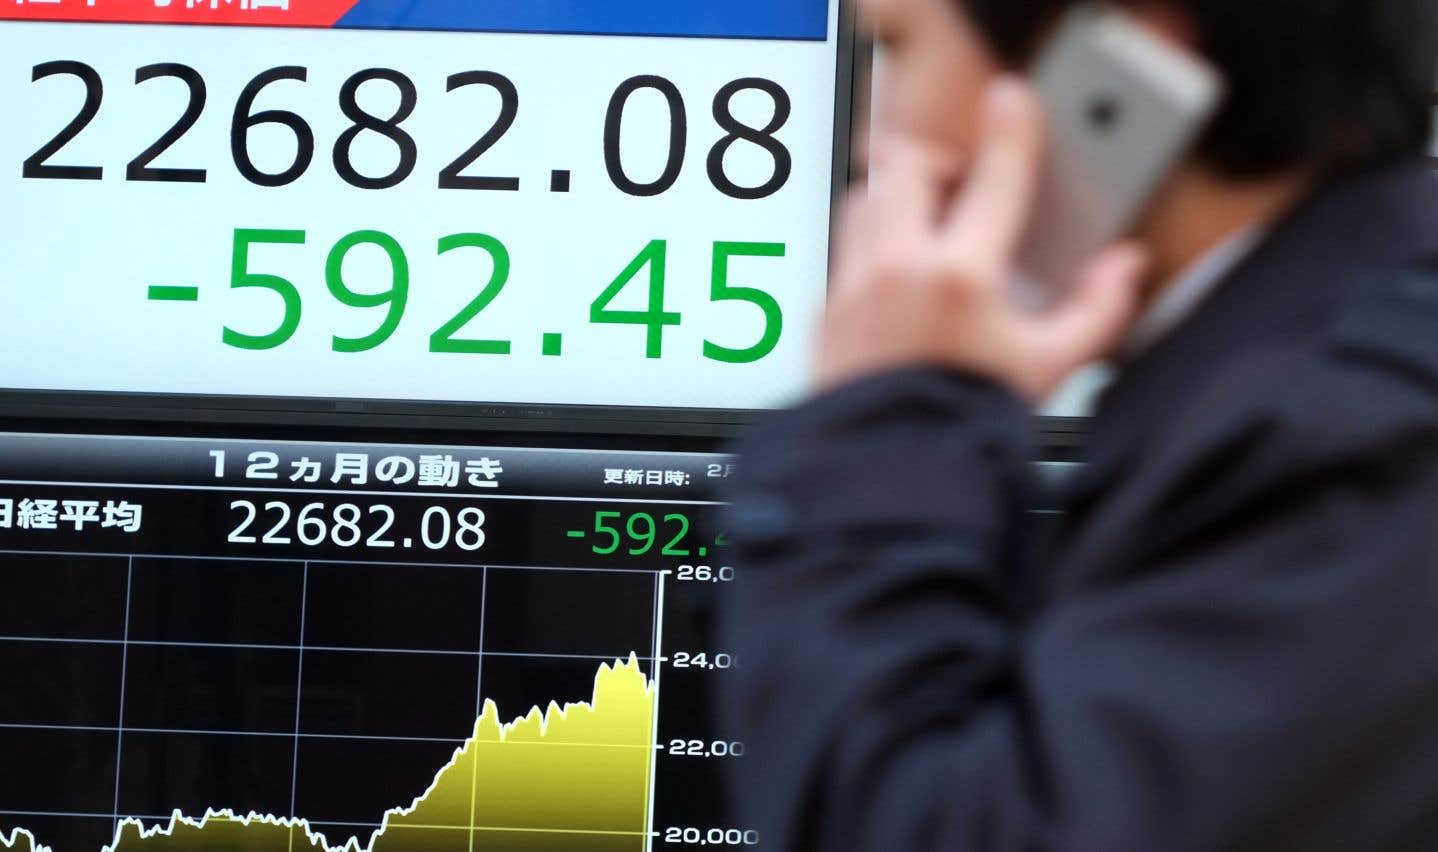 La Bourse de Tokyo lors de sa fermeture, lundi